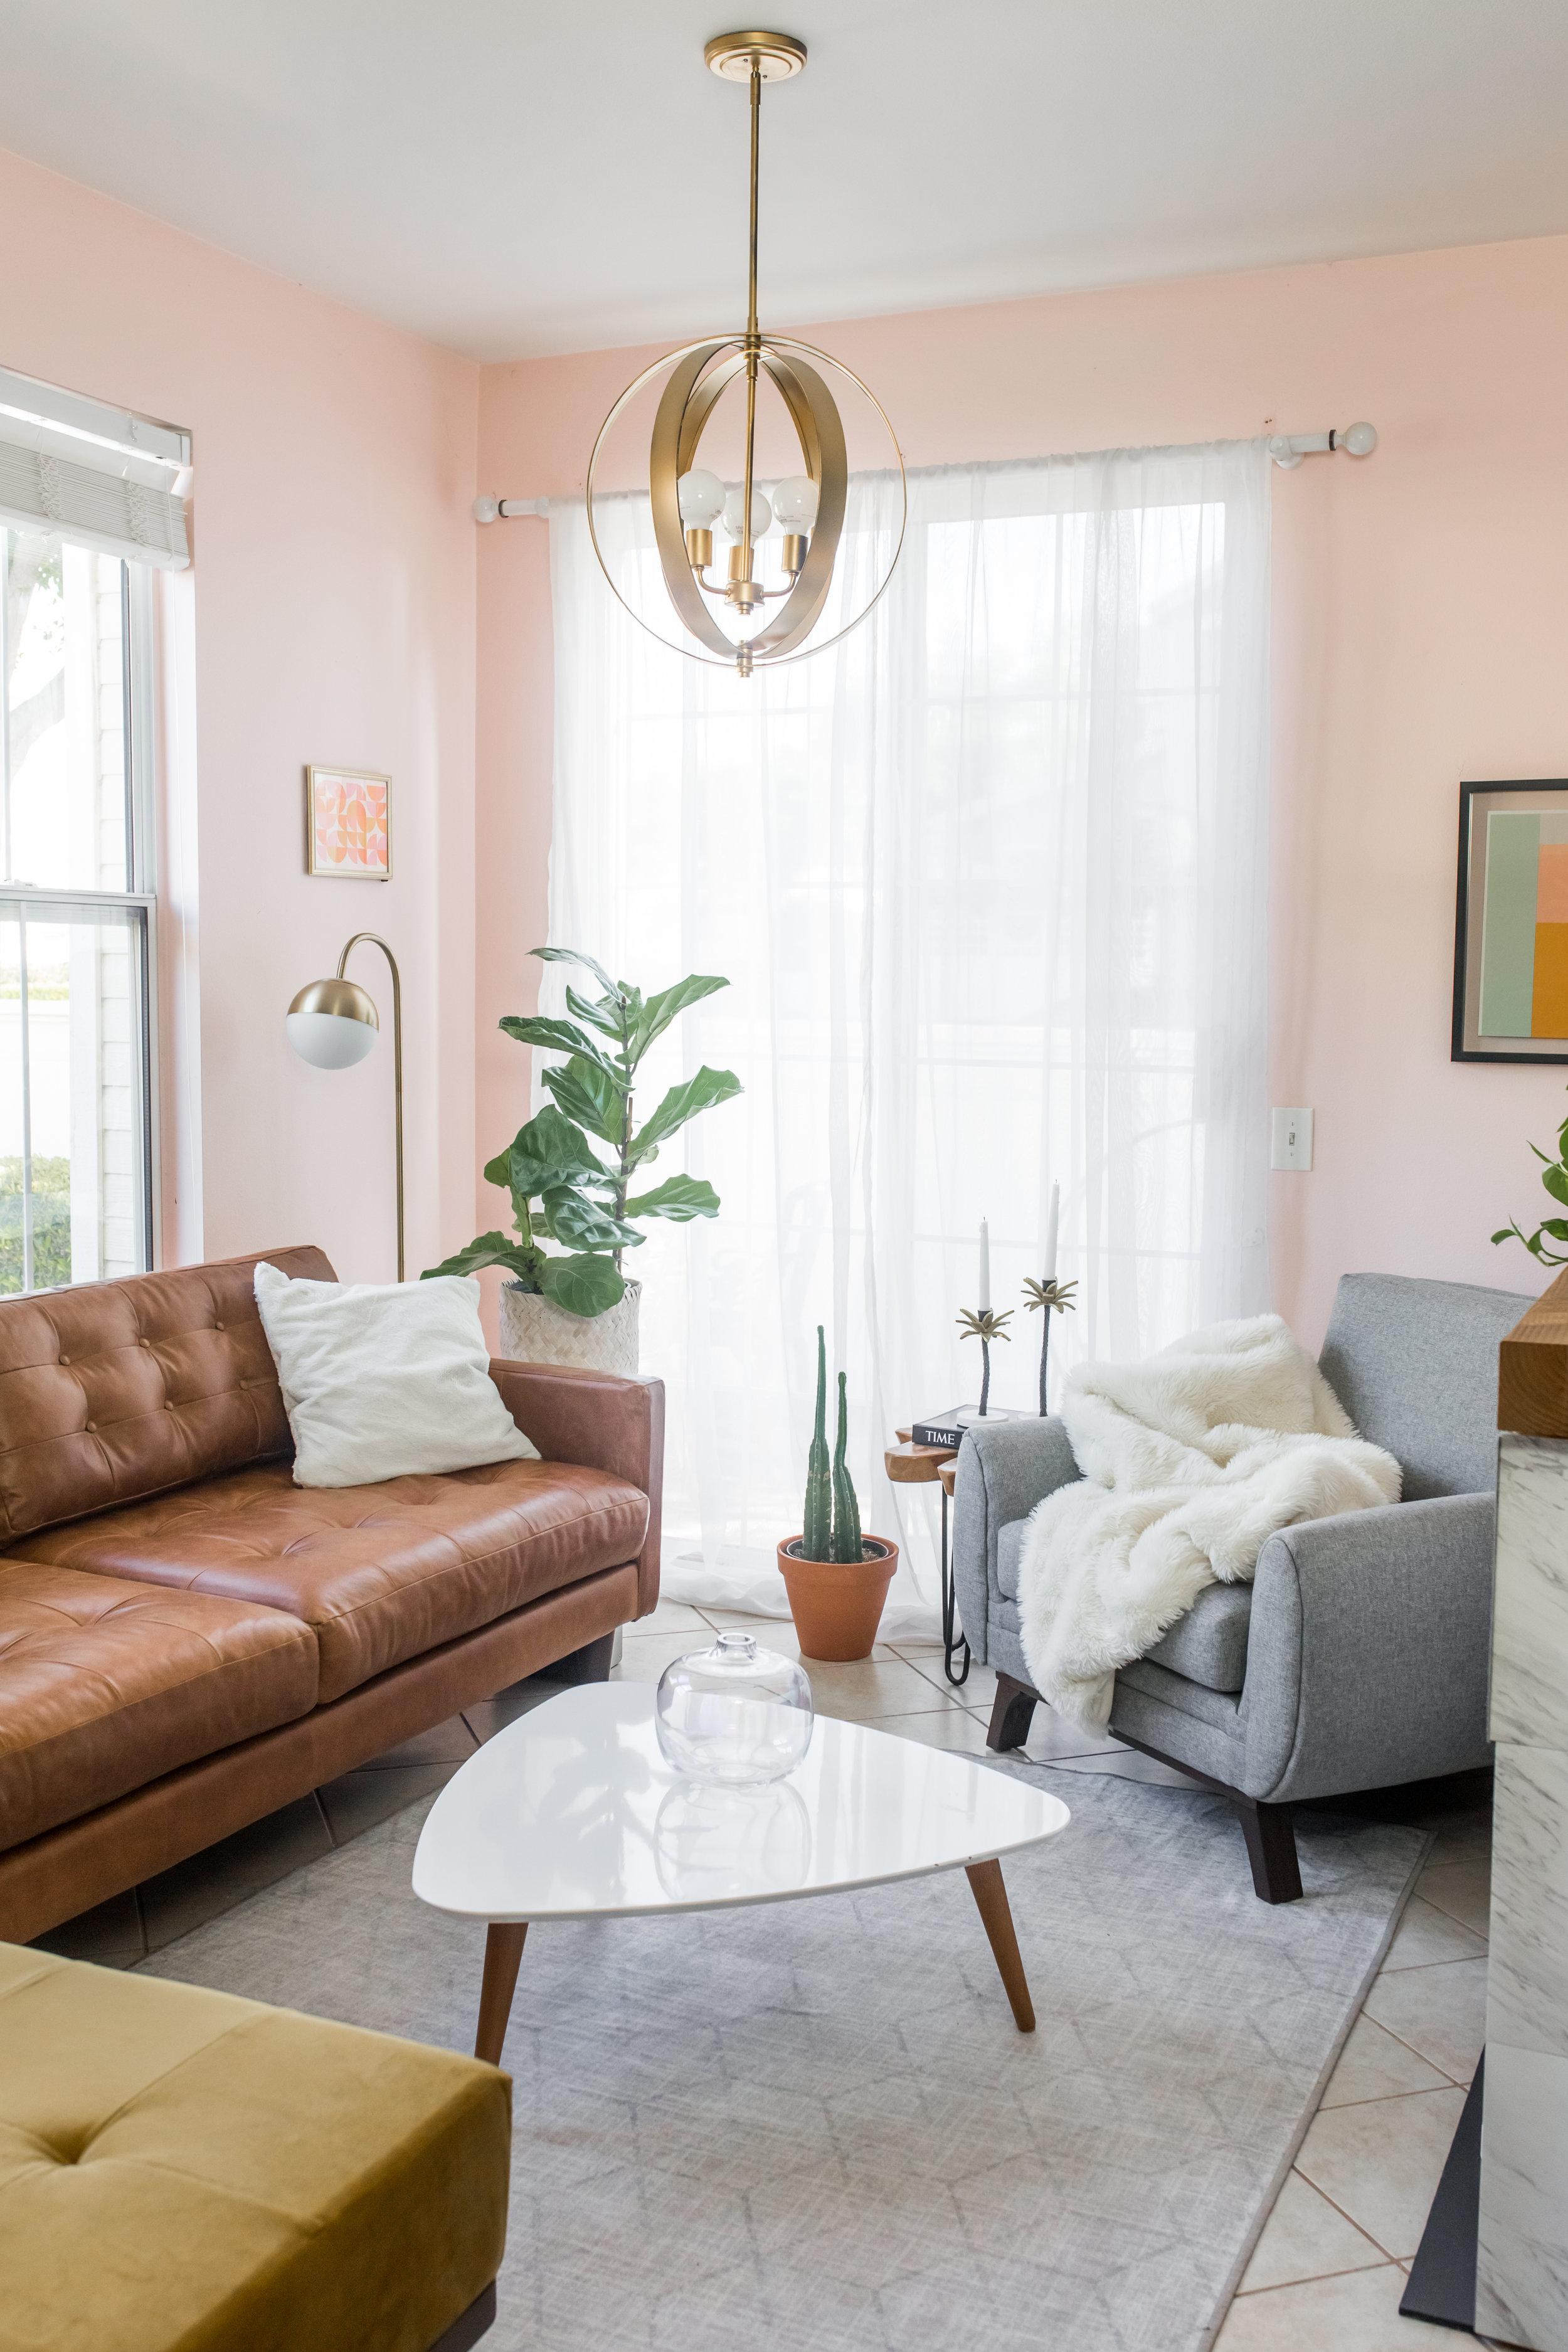 julie-tecson-joybird-living-room-15.jpg